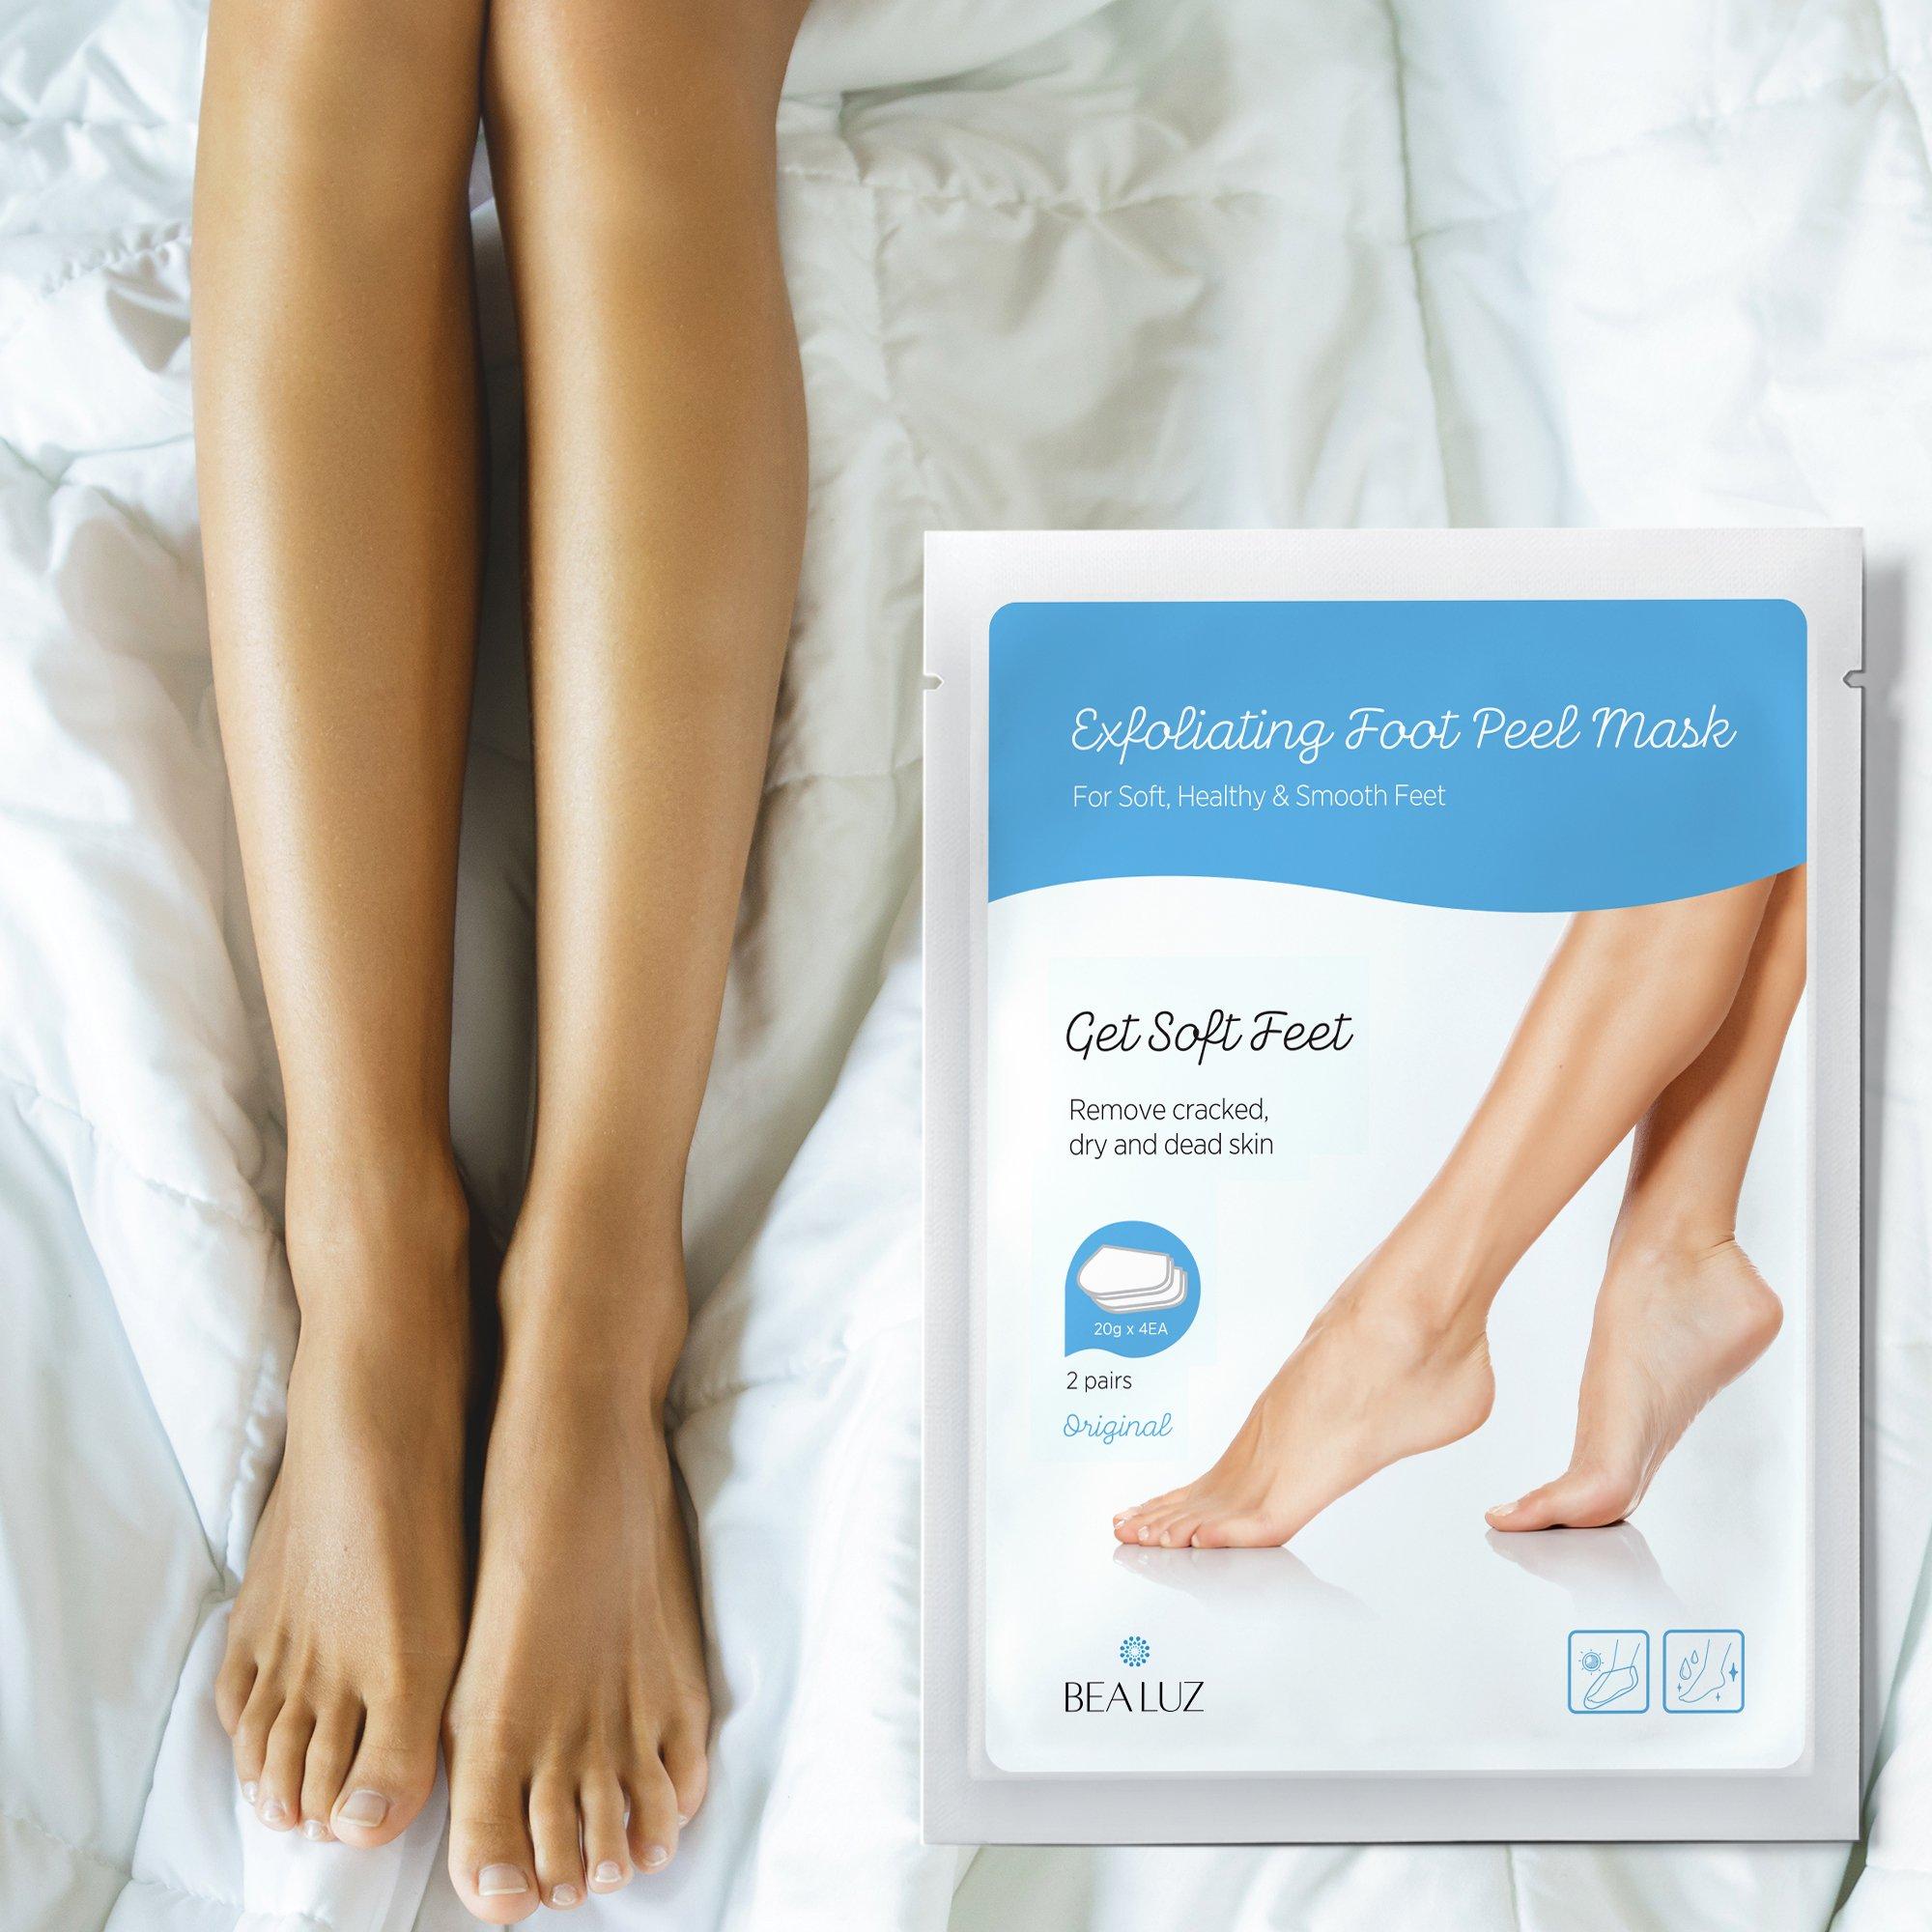 2 Pairs Exfoliating Foot Peel Mask, Soft & Smooth Feet, Peeling Away Rough Dead Skin & Calluses in 1-2 Weeks, Repairing Exfoliant by BEALUZ (Image #6)